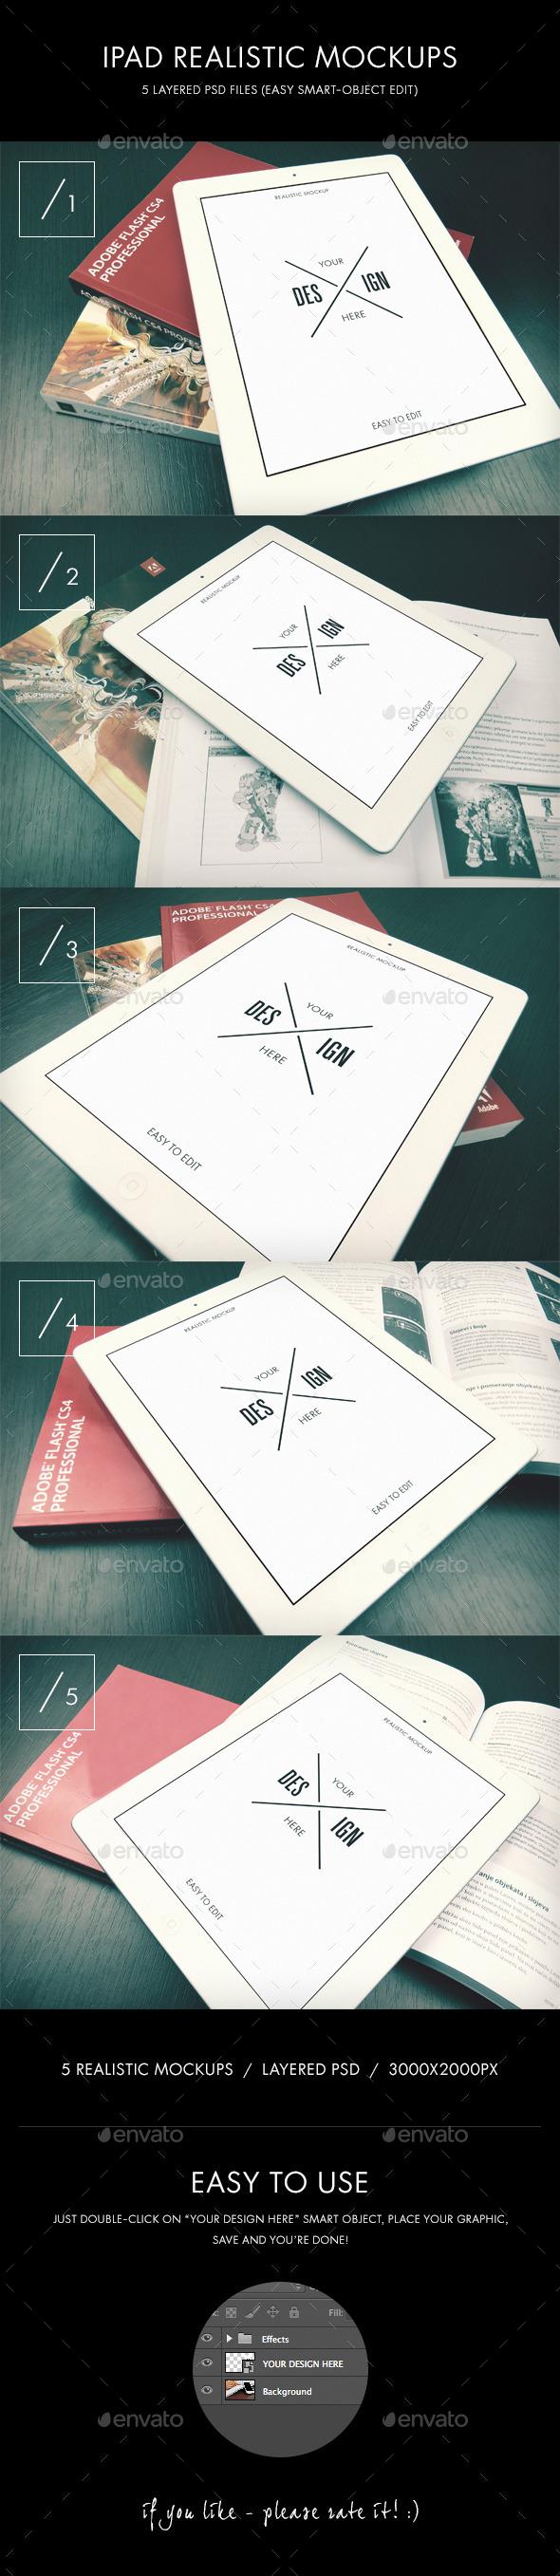 GraphicRiver iPad Realistic Mockups 8818350